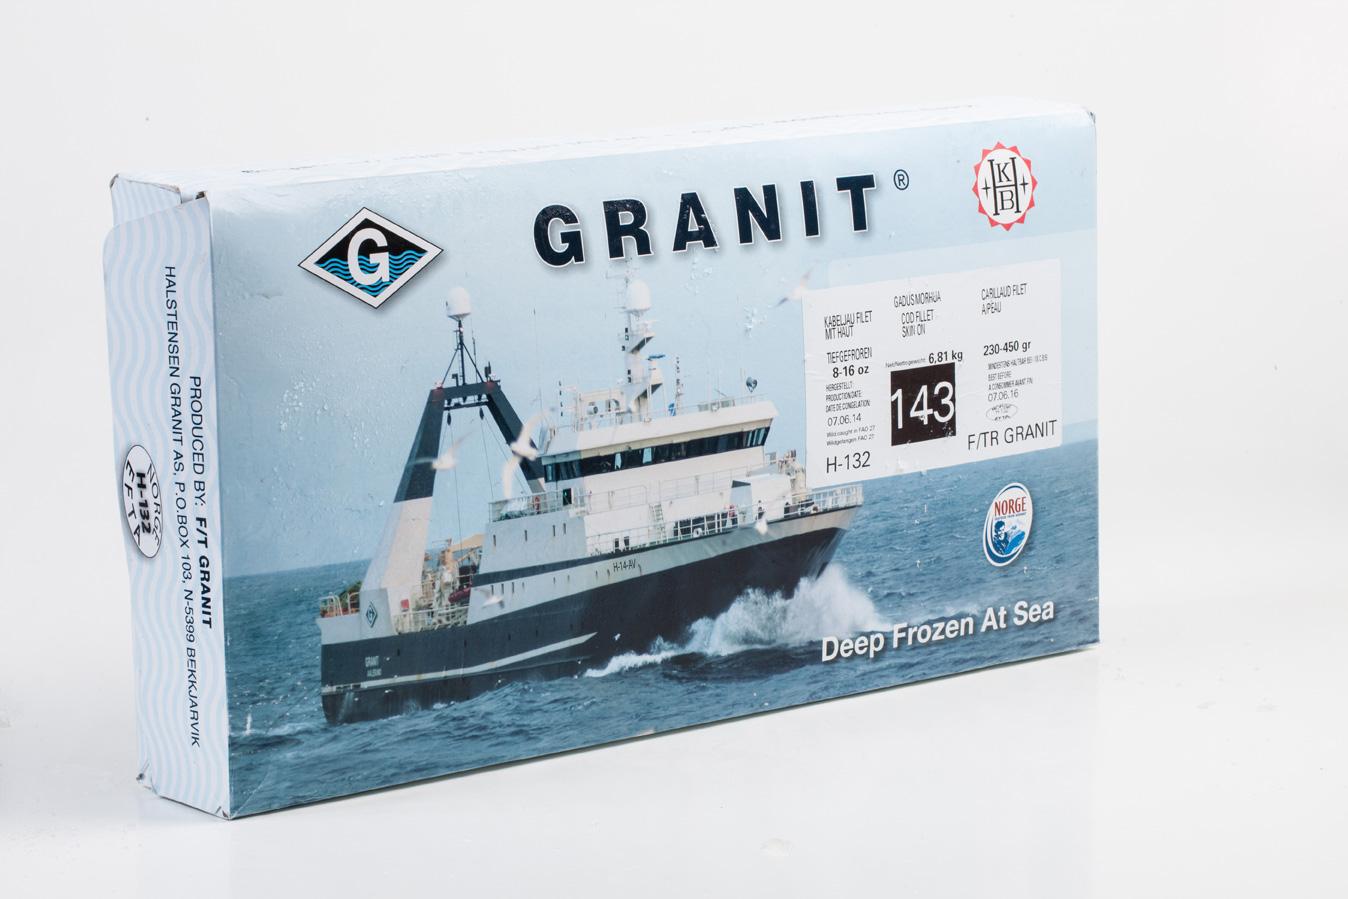 Groothandel-vis-FishXL-vis-kabeljauwfilet_WL_9659